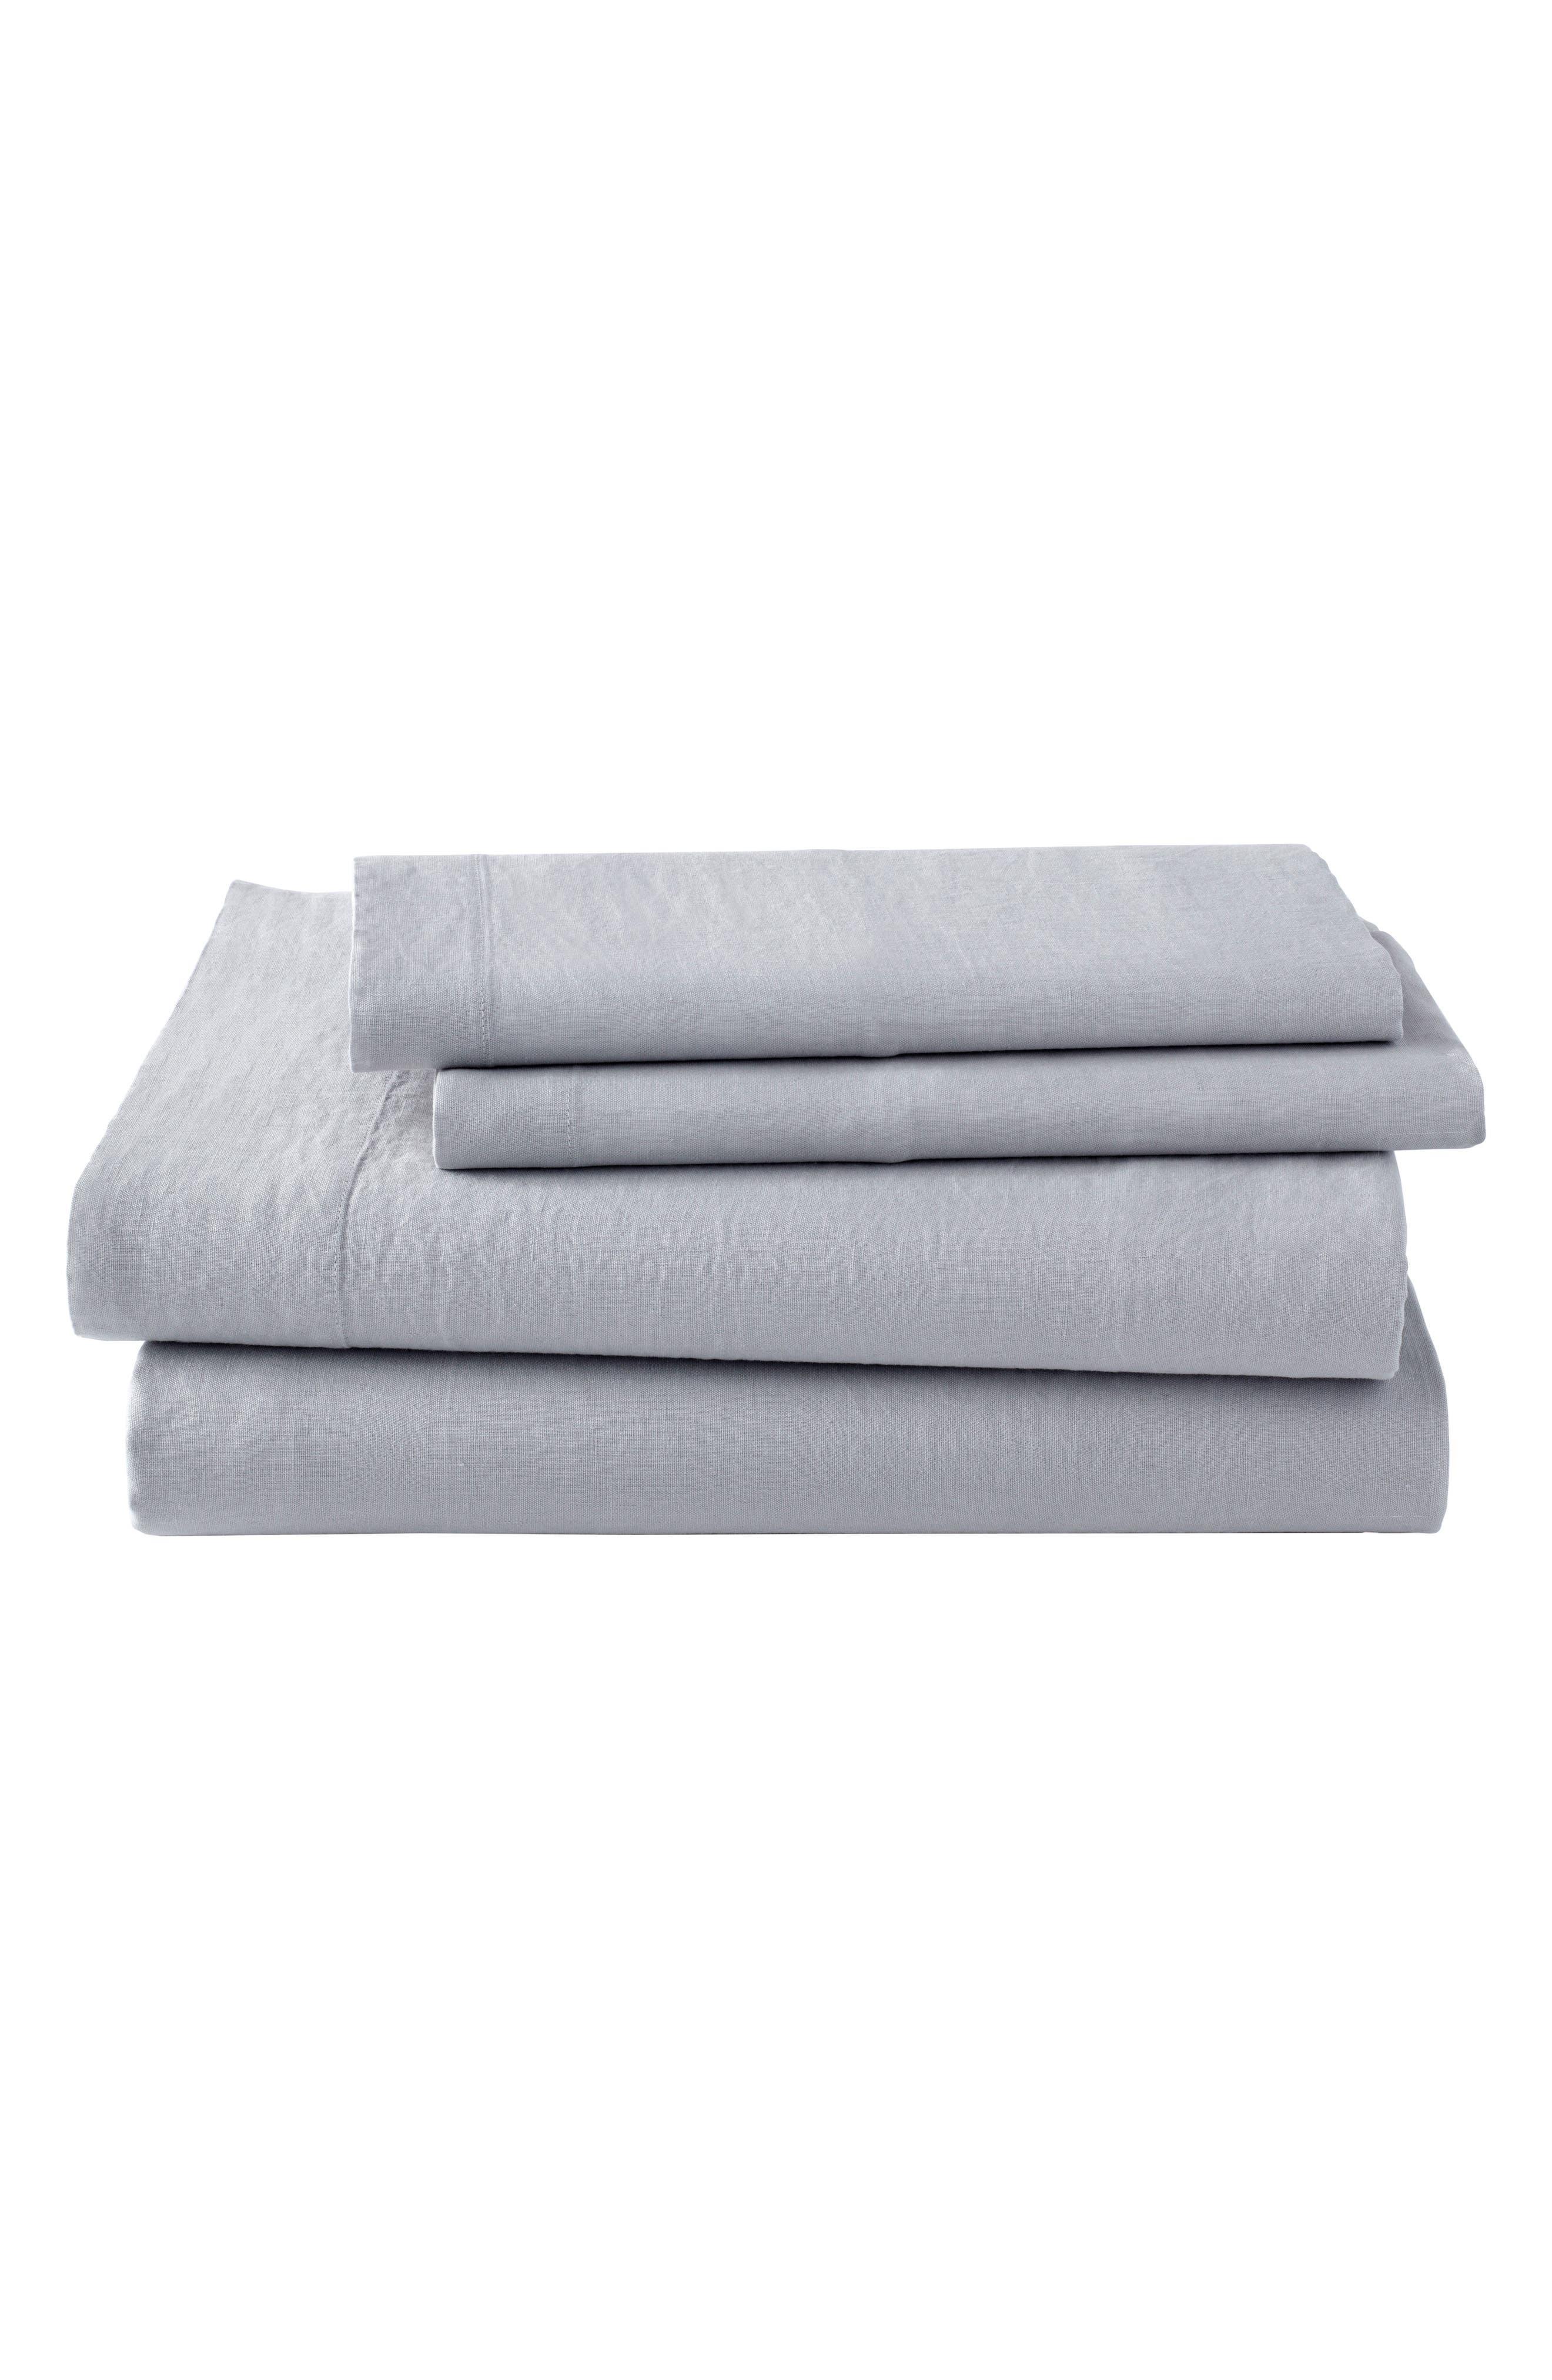 Main Image - KASSATEX Lino Linen 300 Thread Count Pillowcase